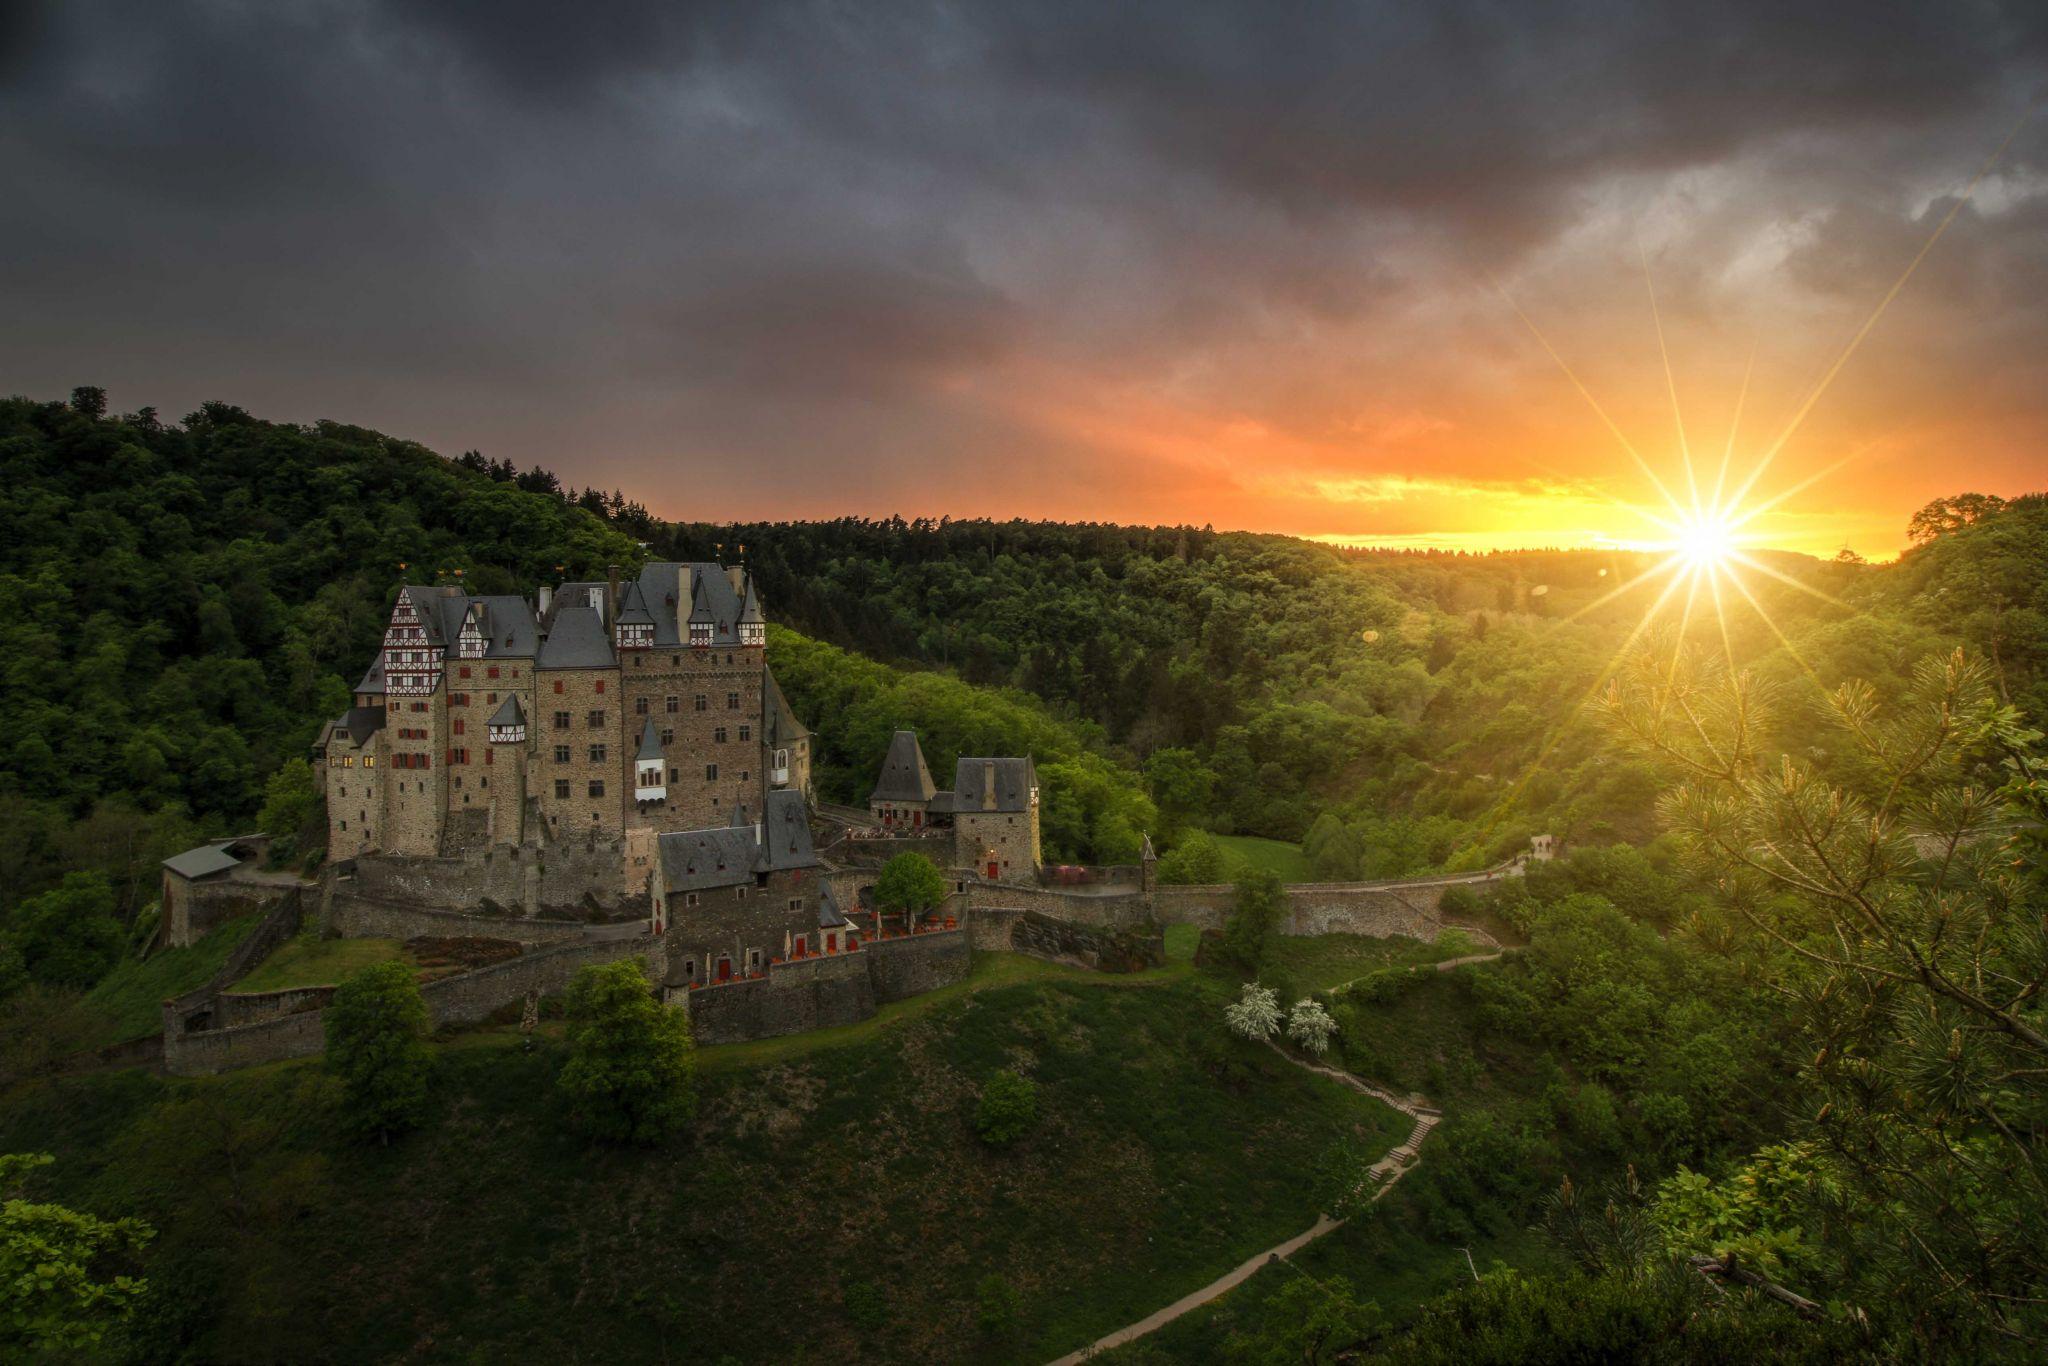 Sunset Burg Eltz castel, Germany